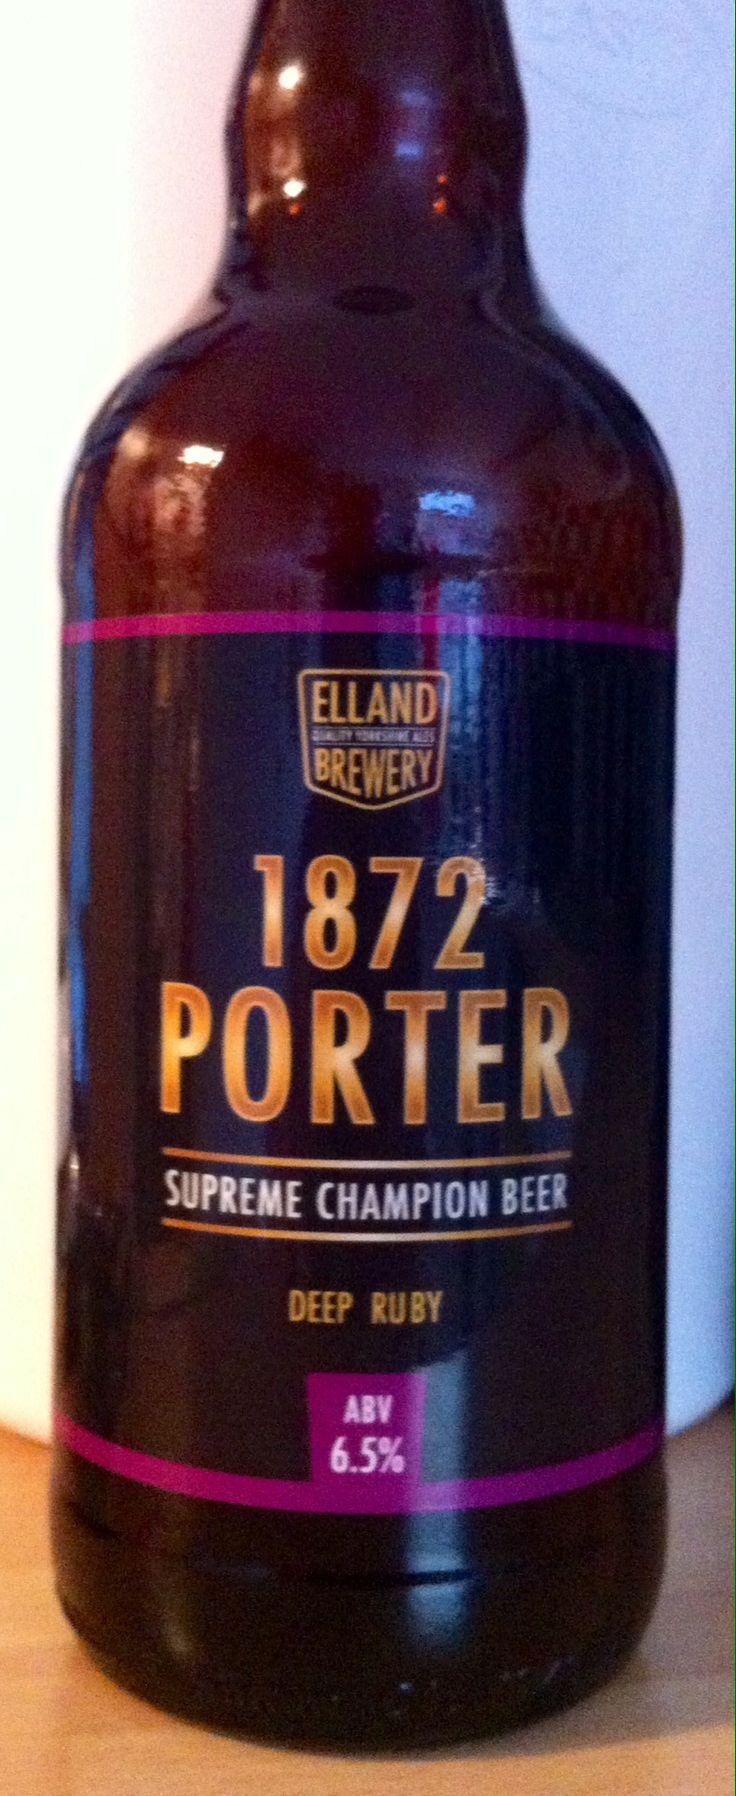 1872 Porter. ABV 6.5%. Elland Brewery, Elland, West Yorkshire. 9/10